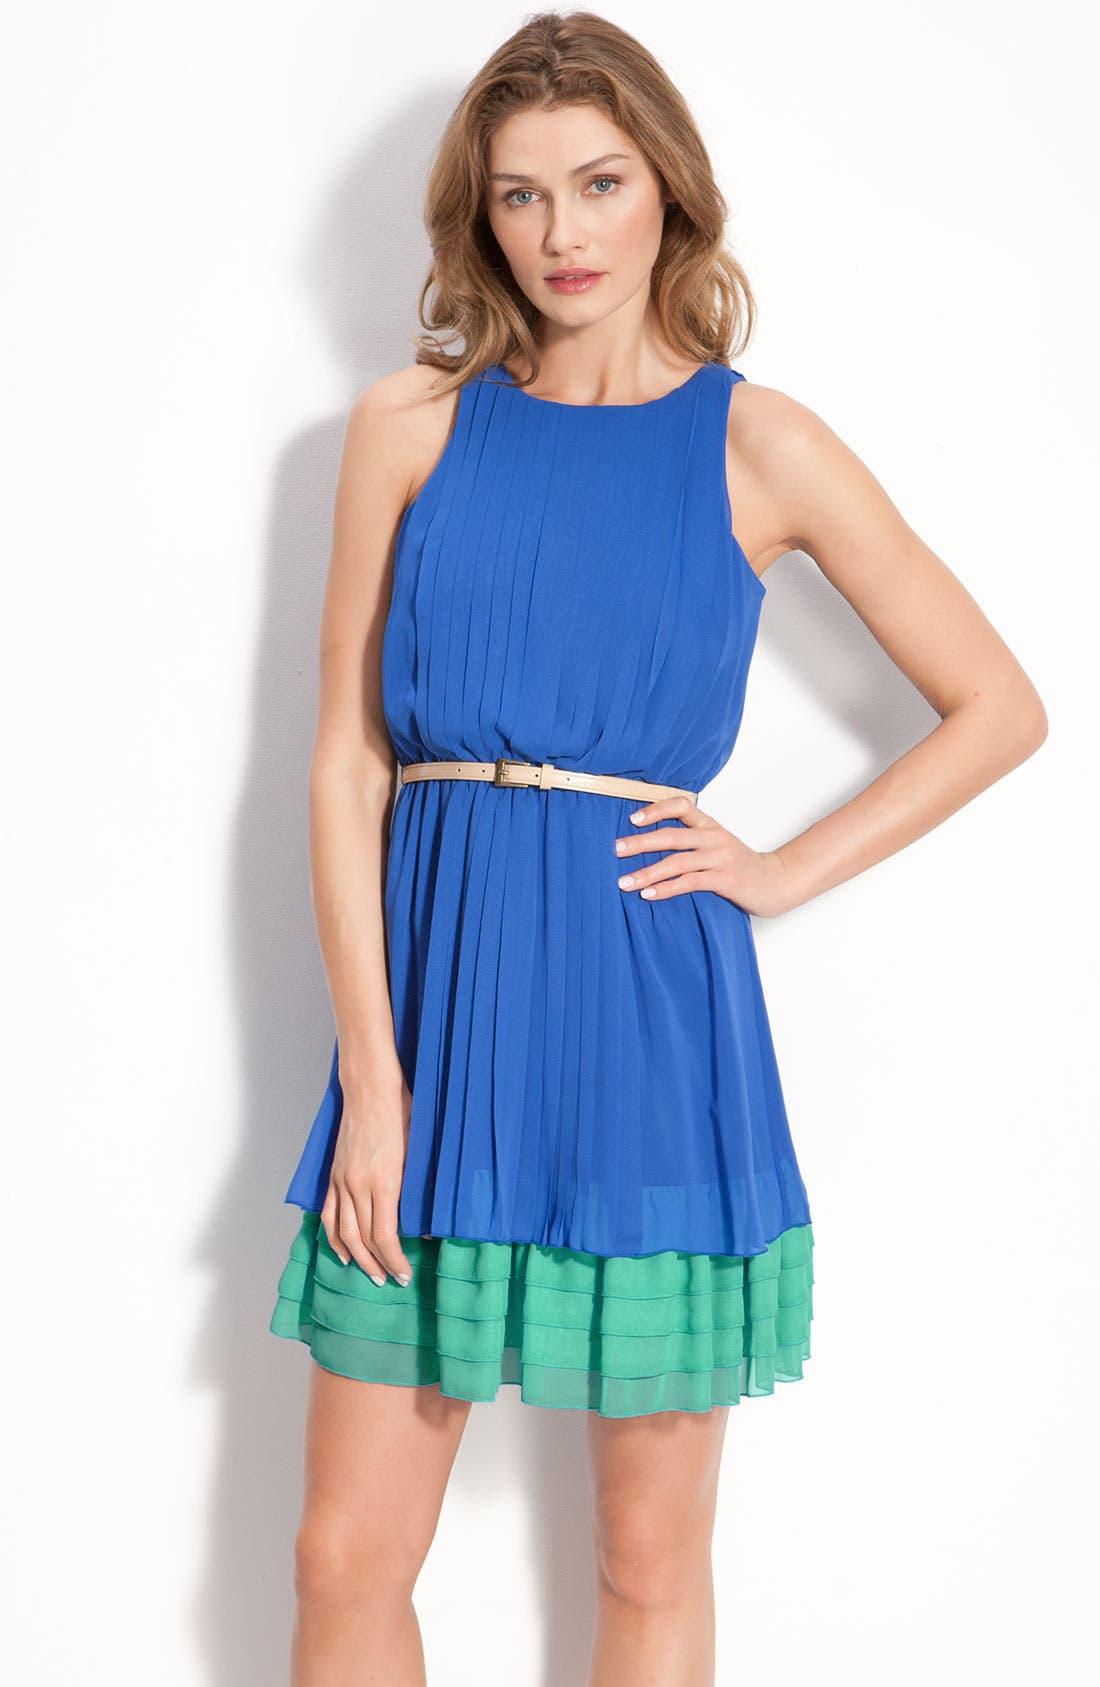 Alternate Image 1 Selected - Jessica Simpson Sleeveless Chiffon Dress